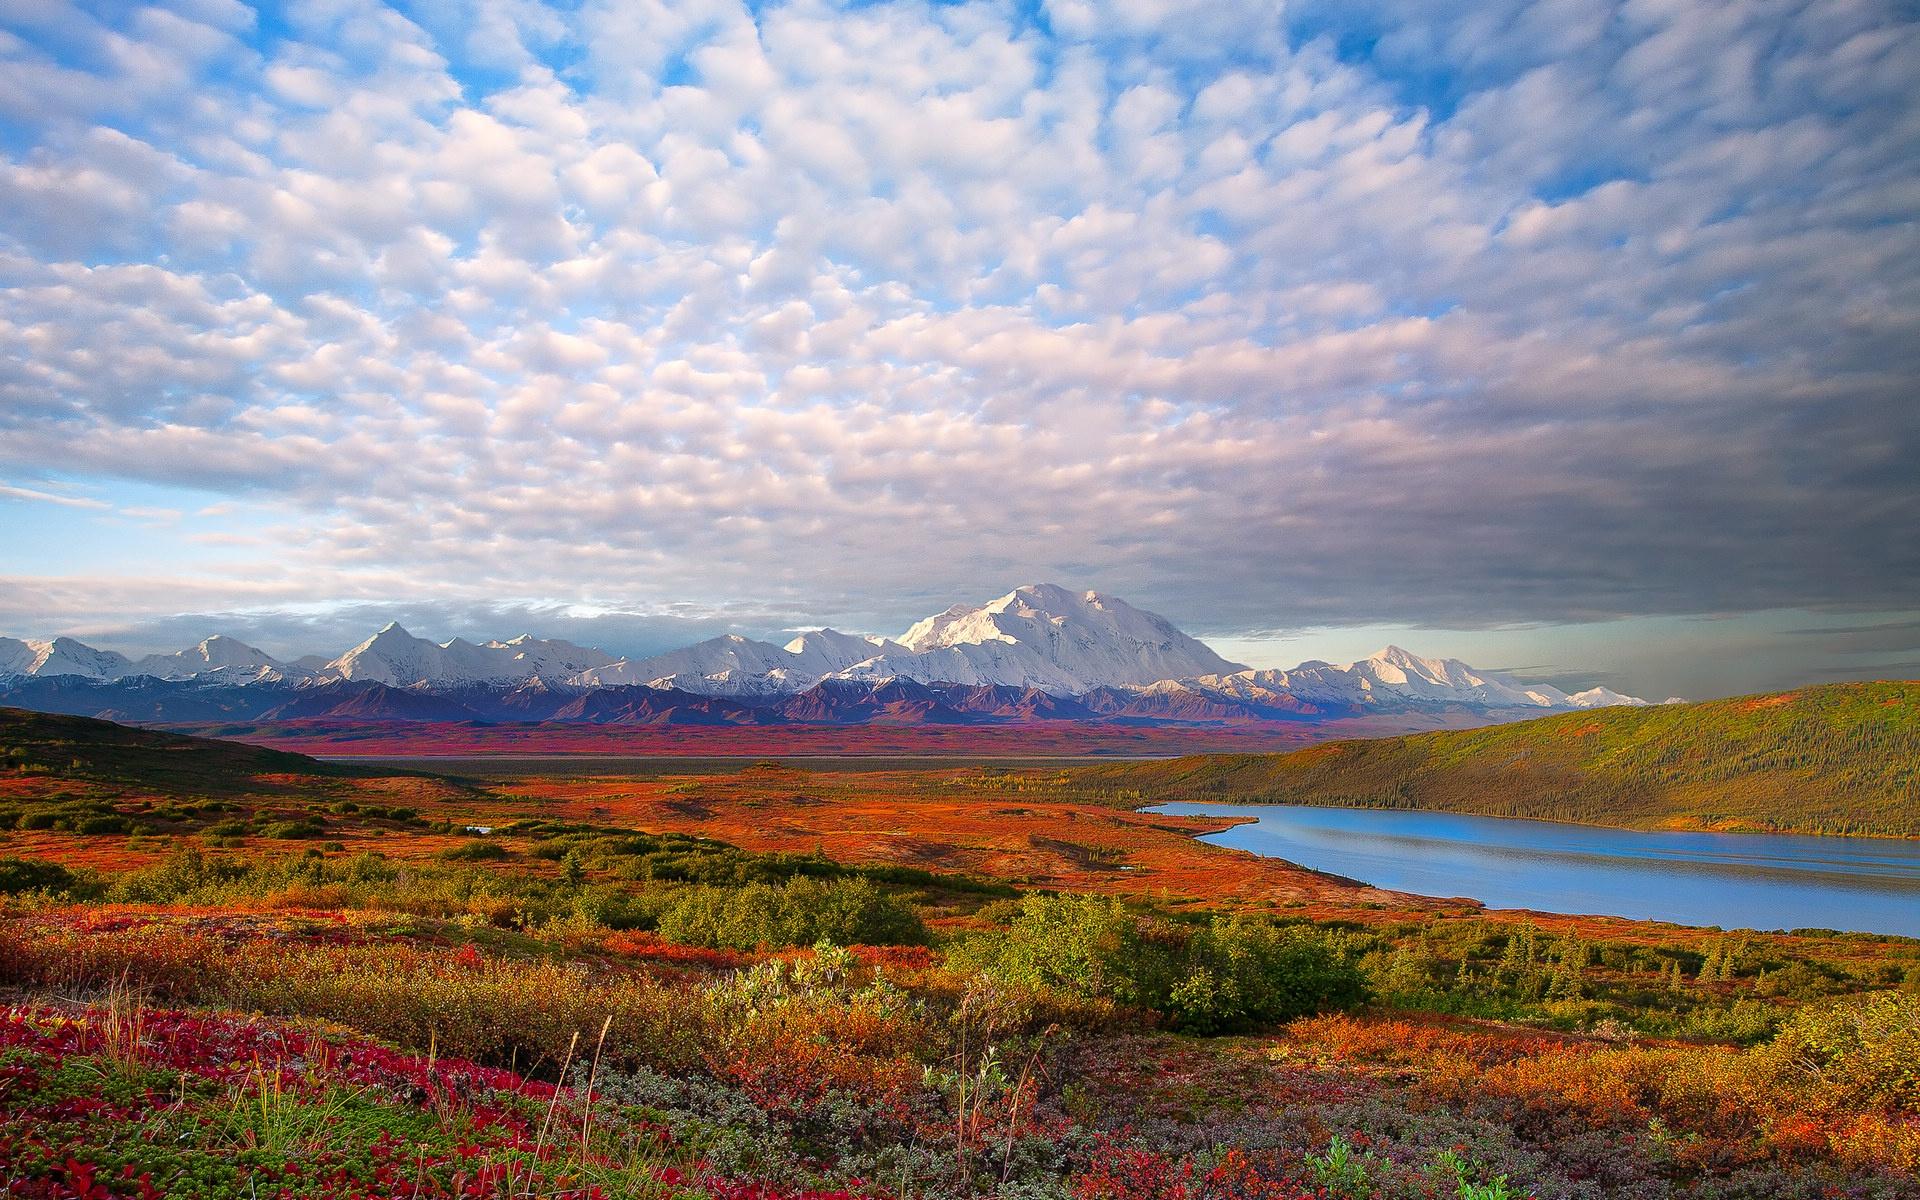 Thye Best Landscape Paintings